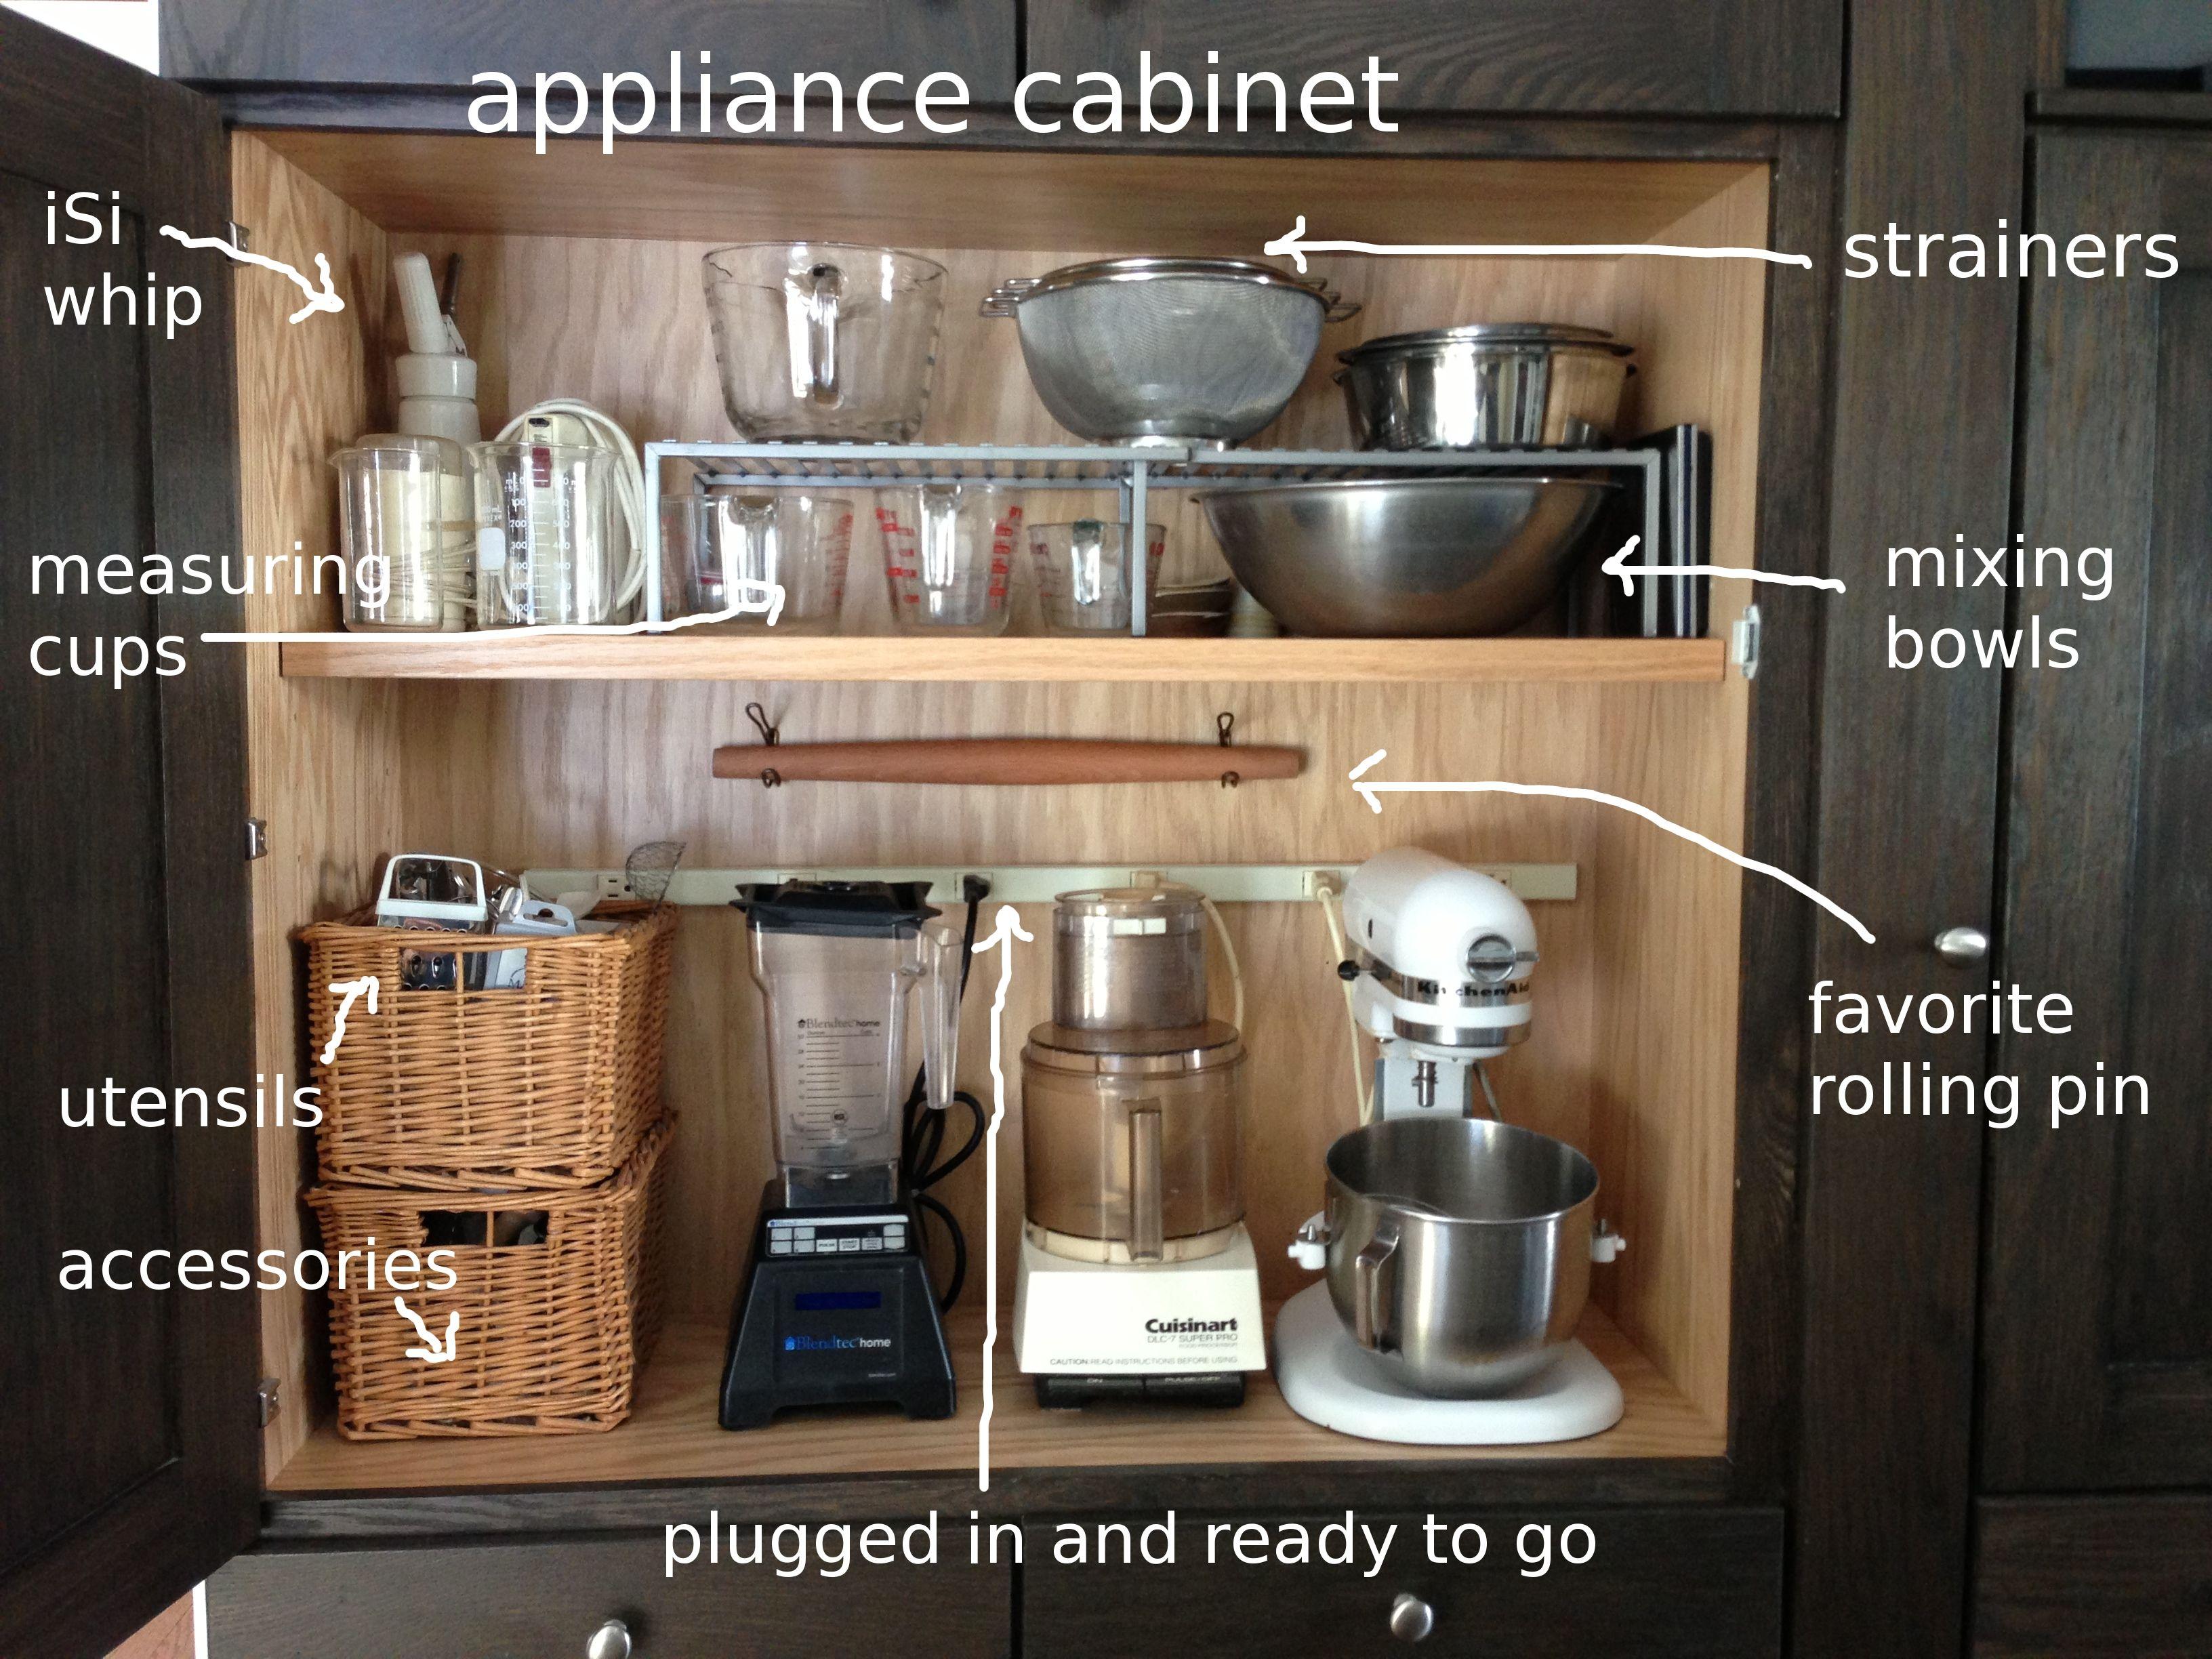 6a00e54fcc29da8834017d40a69cd5970c Pi 3264 2448 Kitchen Cabinet Organization Layout Kitchen Appliances Organization Kitchen Appliance Storage